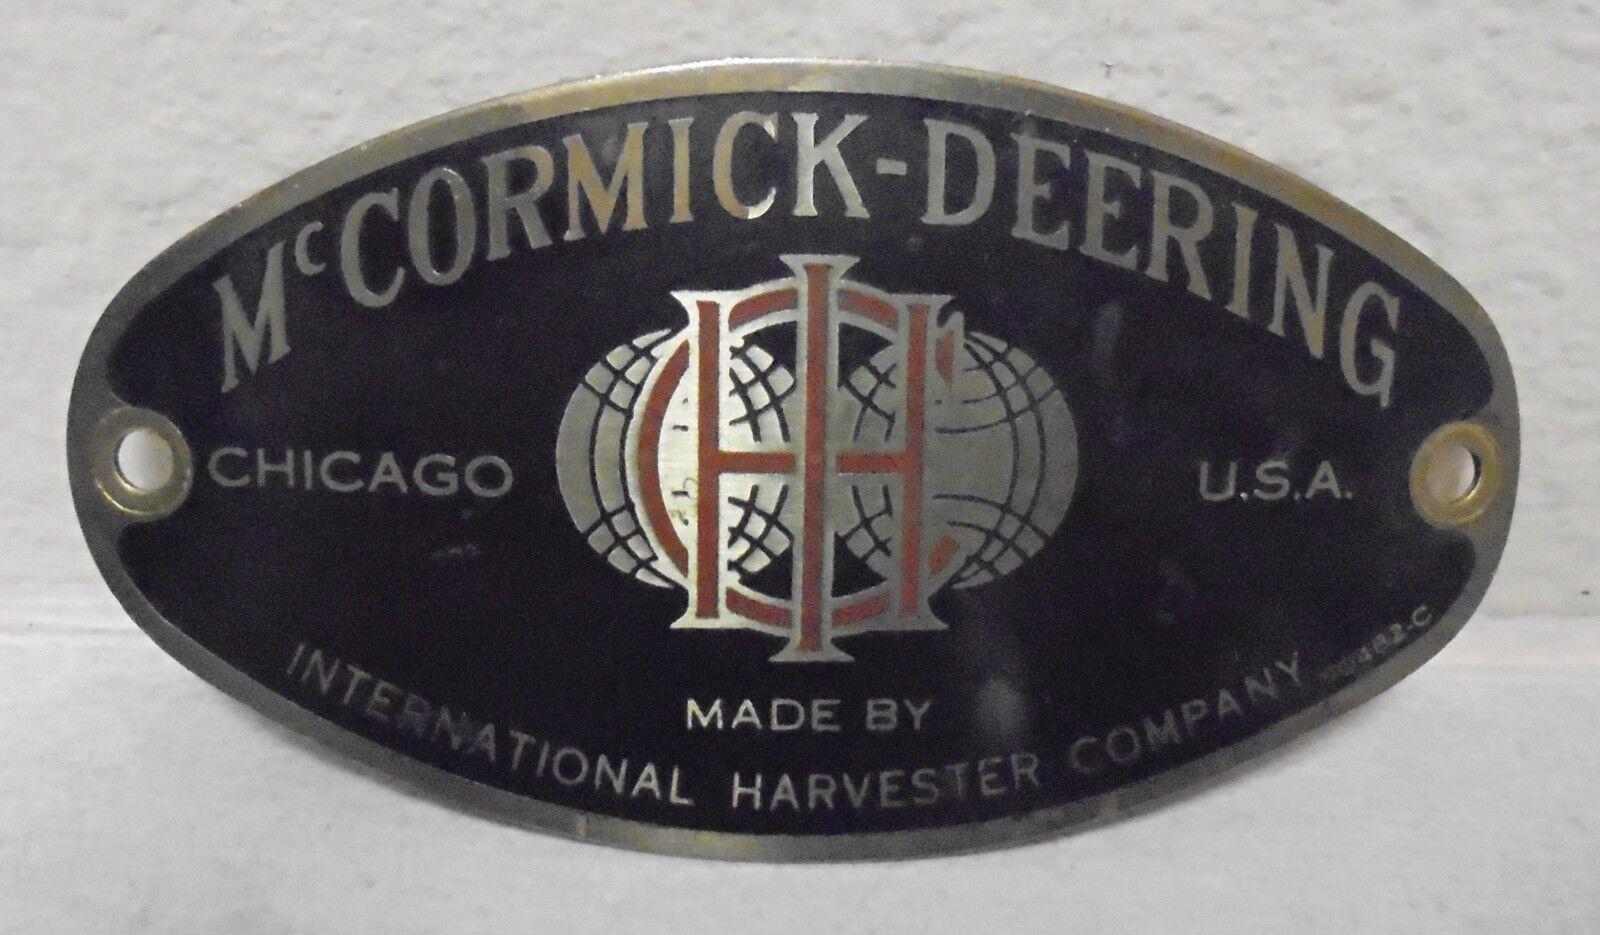 International Harvester McCormick-Deering Cream Separator Tag 10482-C